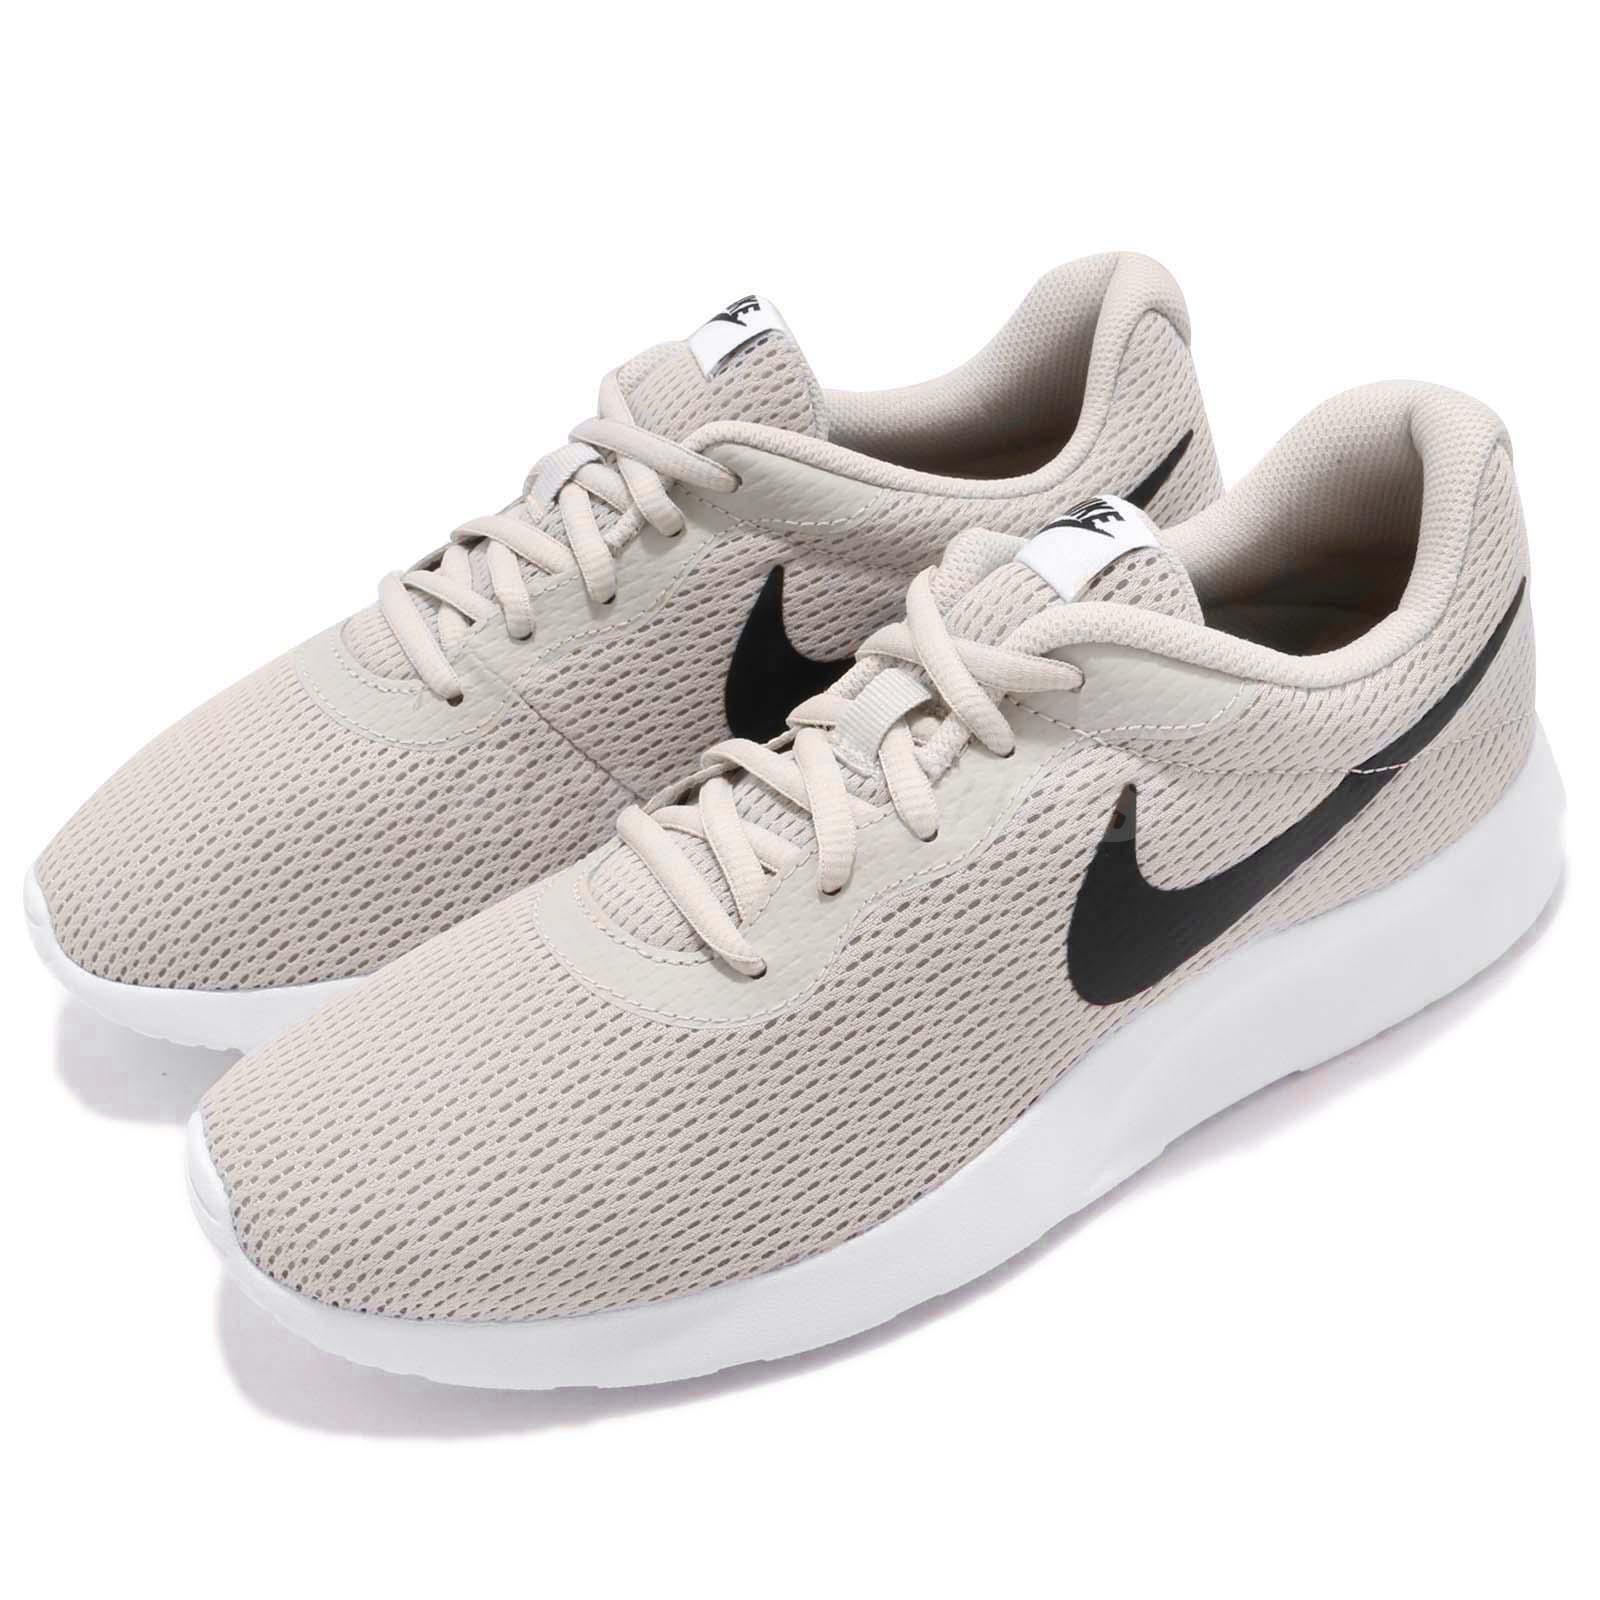 f3ef83ff56959 Details about Nike Tanjun Light Bone Black White Men Running Shoes Sneakers  Trainer 812654-012